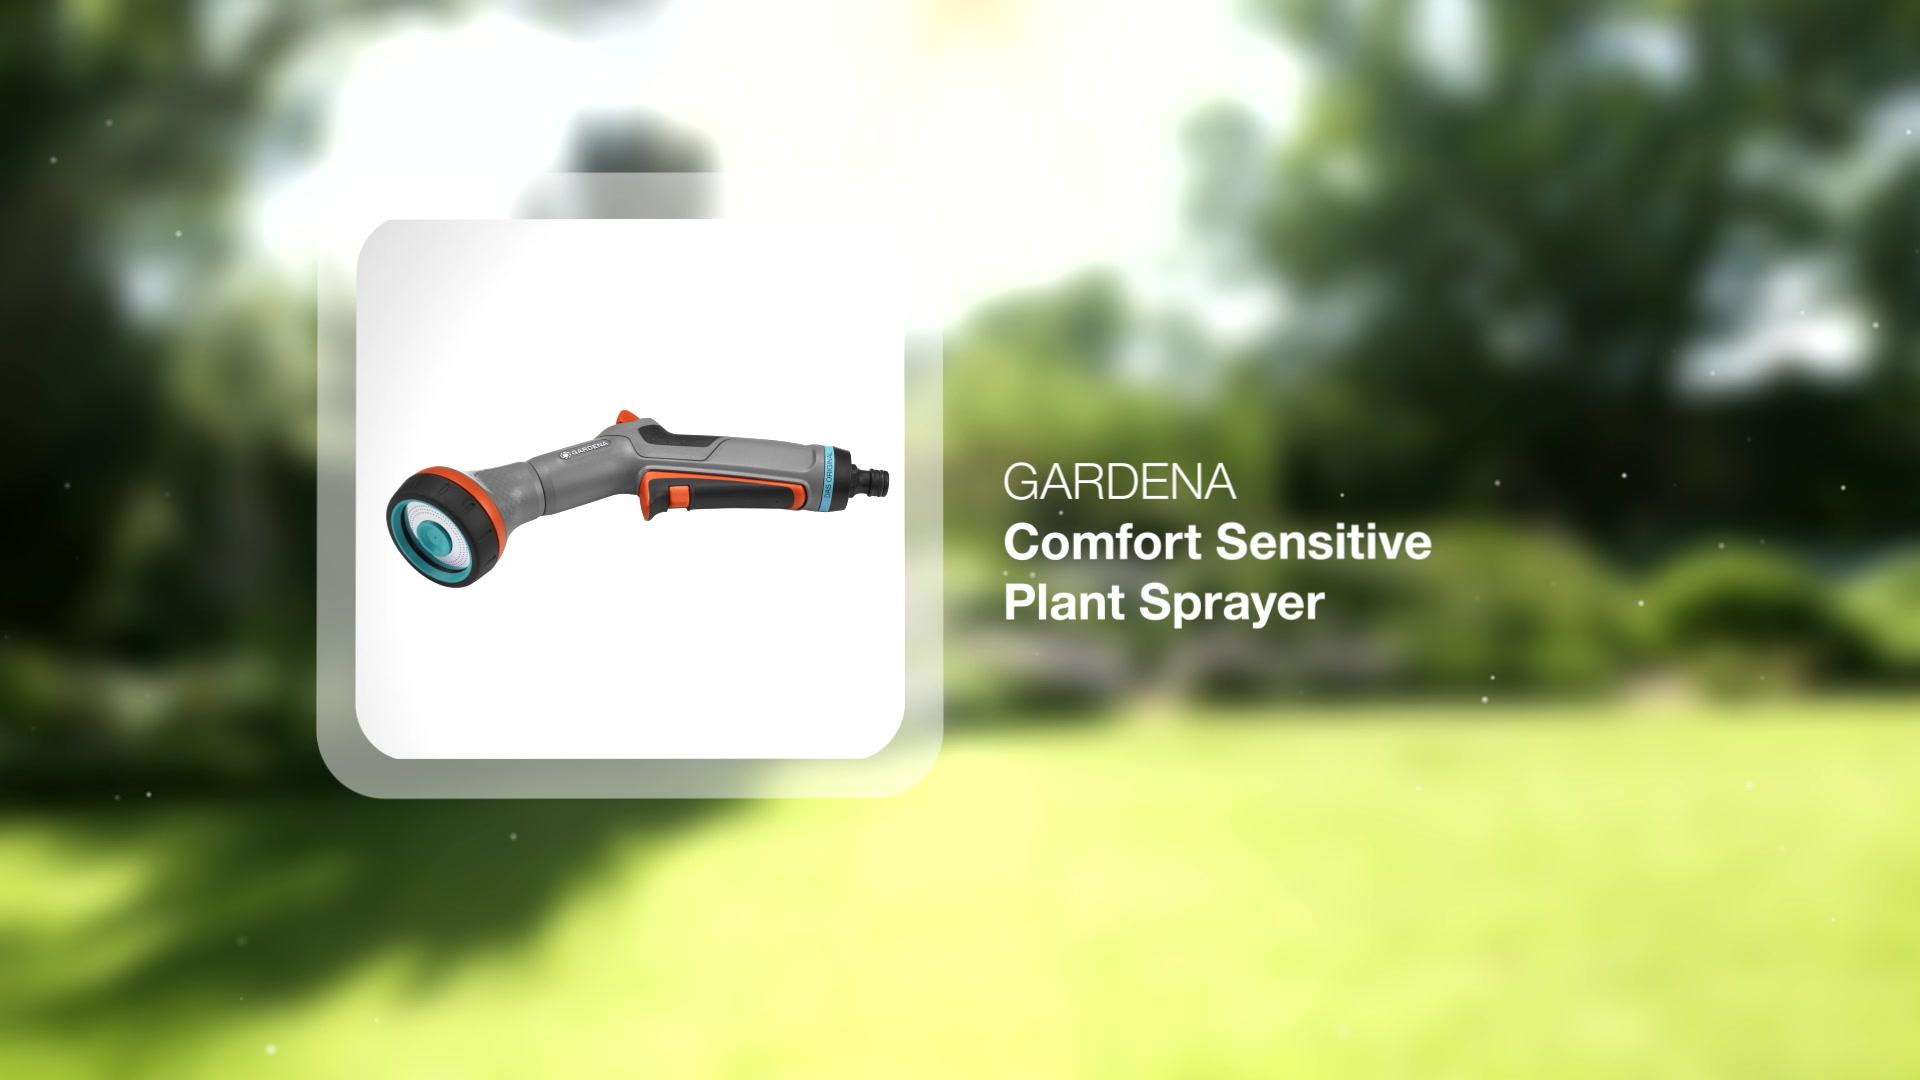 Gardena Nozzles/Sprayers Comfort Sensitive Plant Sprayer